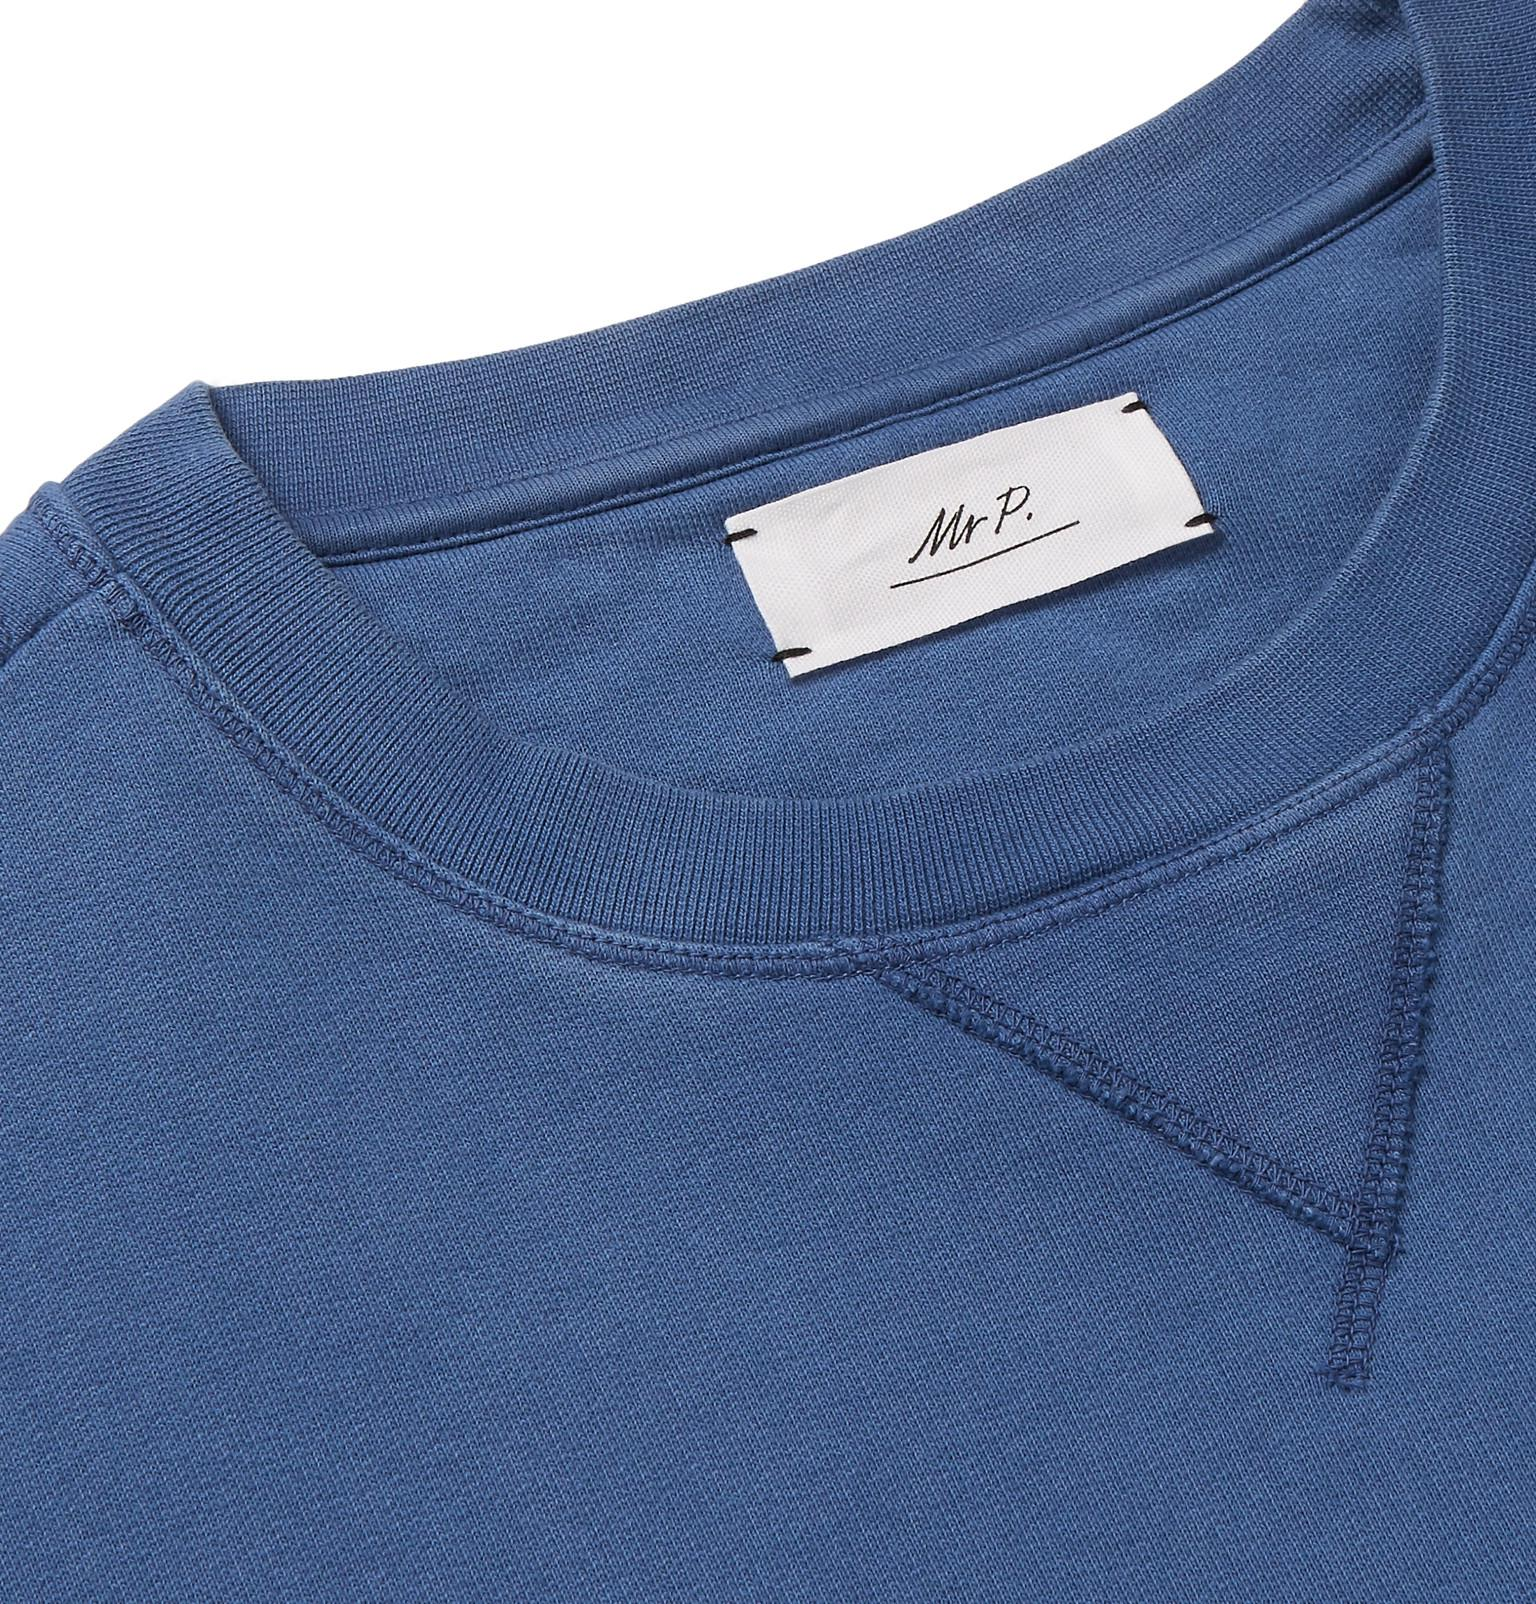 3735db38efe4b7 mr-p-blue-Garment-dyed-Loopback-Cotton-jersey-Sweatshirt.jpeg